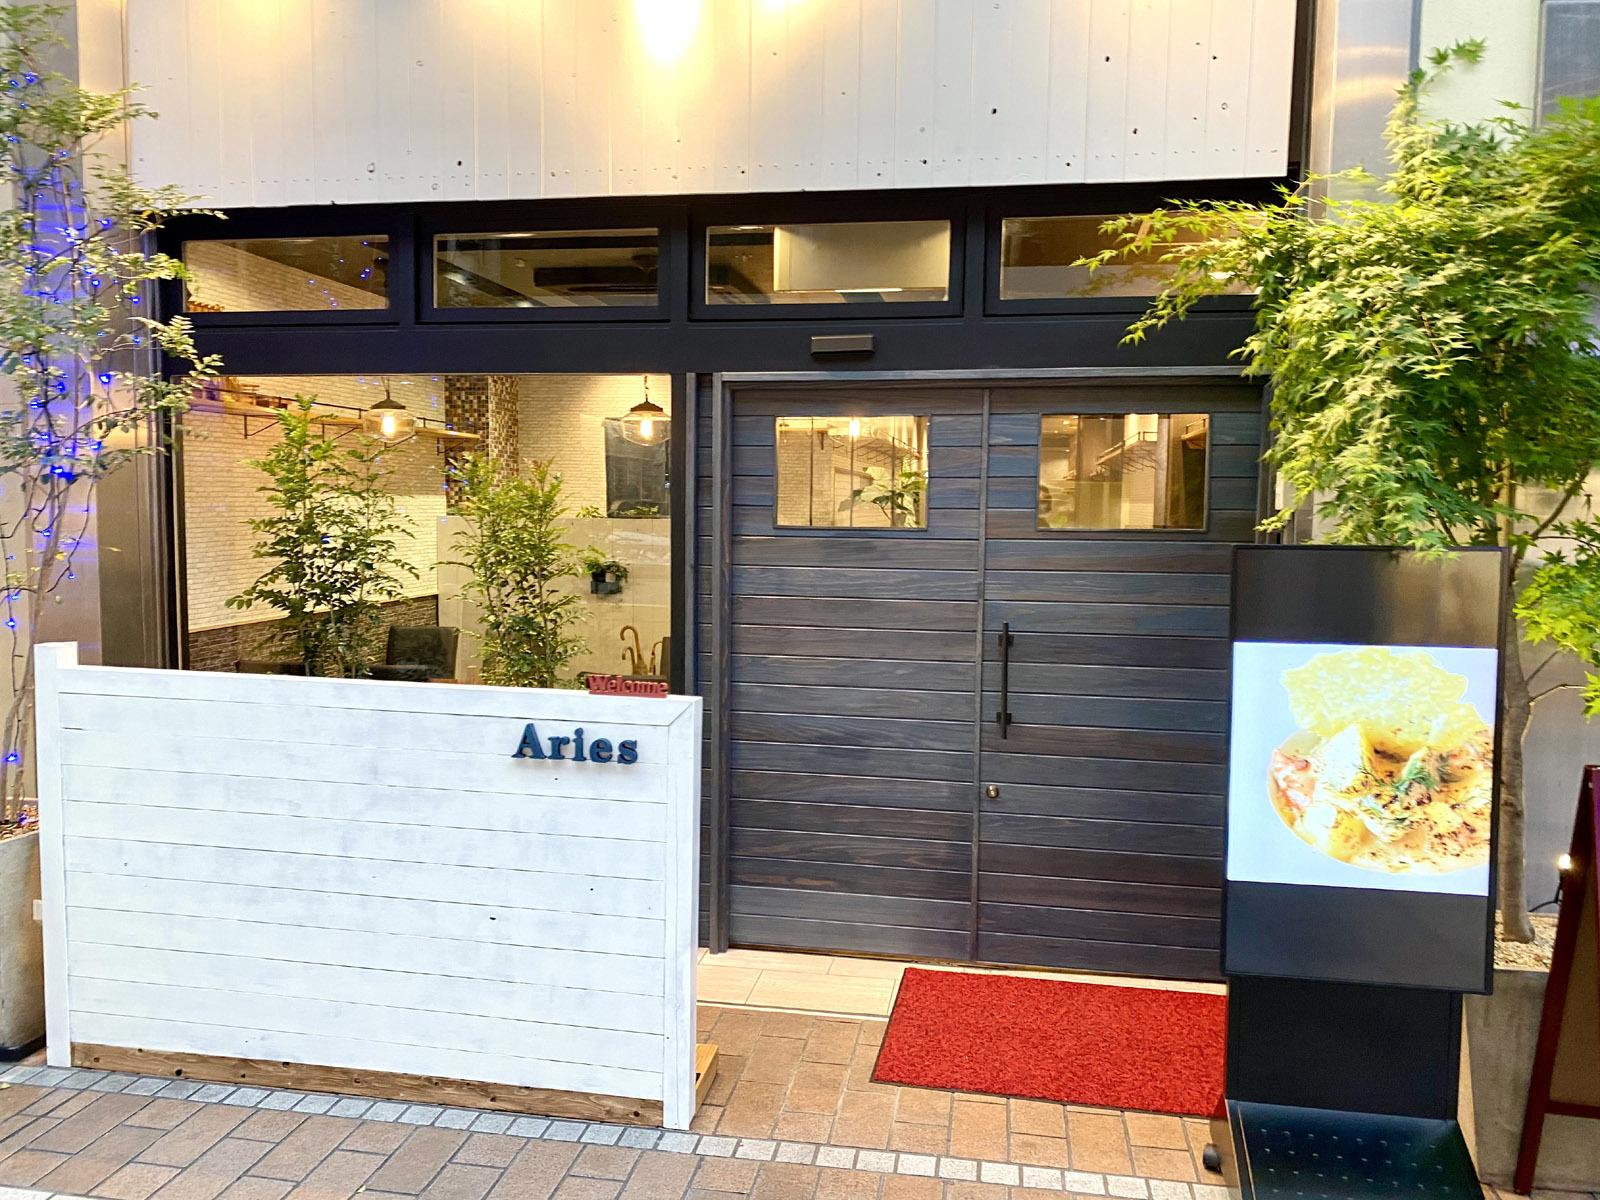 Aries 店舗